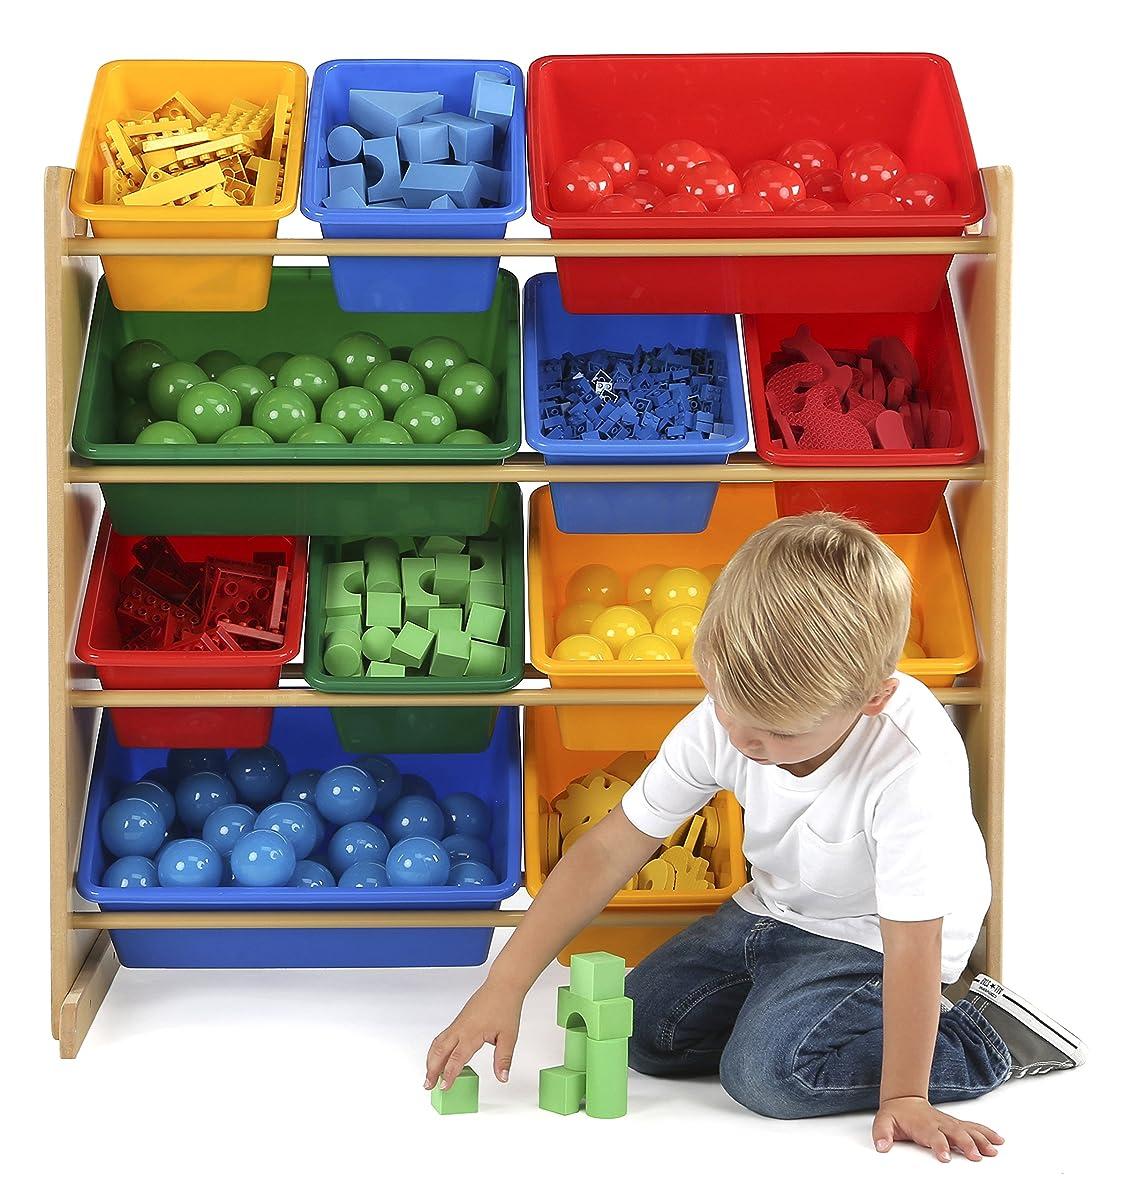 Blue Storage Kids Toy Box Playroom Furniture Bedroom Girls: Tot Tutors Kids Toy Storage Organizer With 12 Plastic Bins